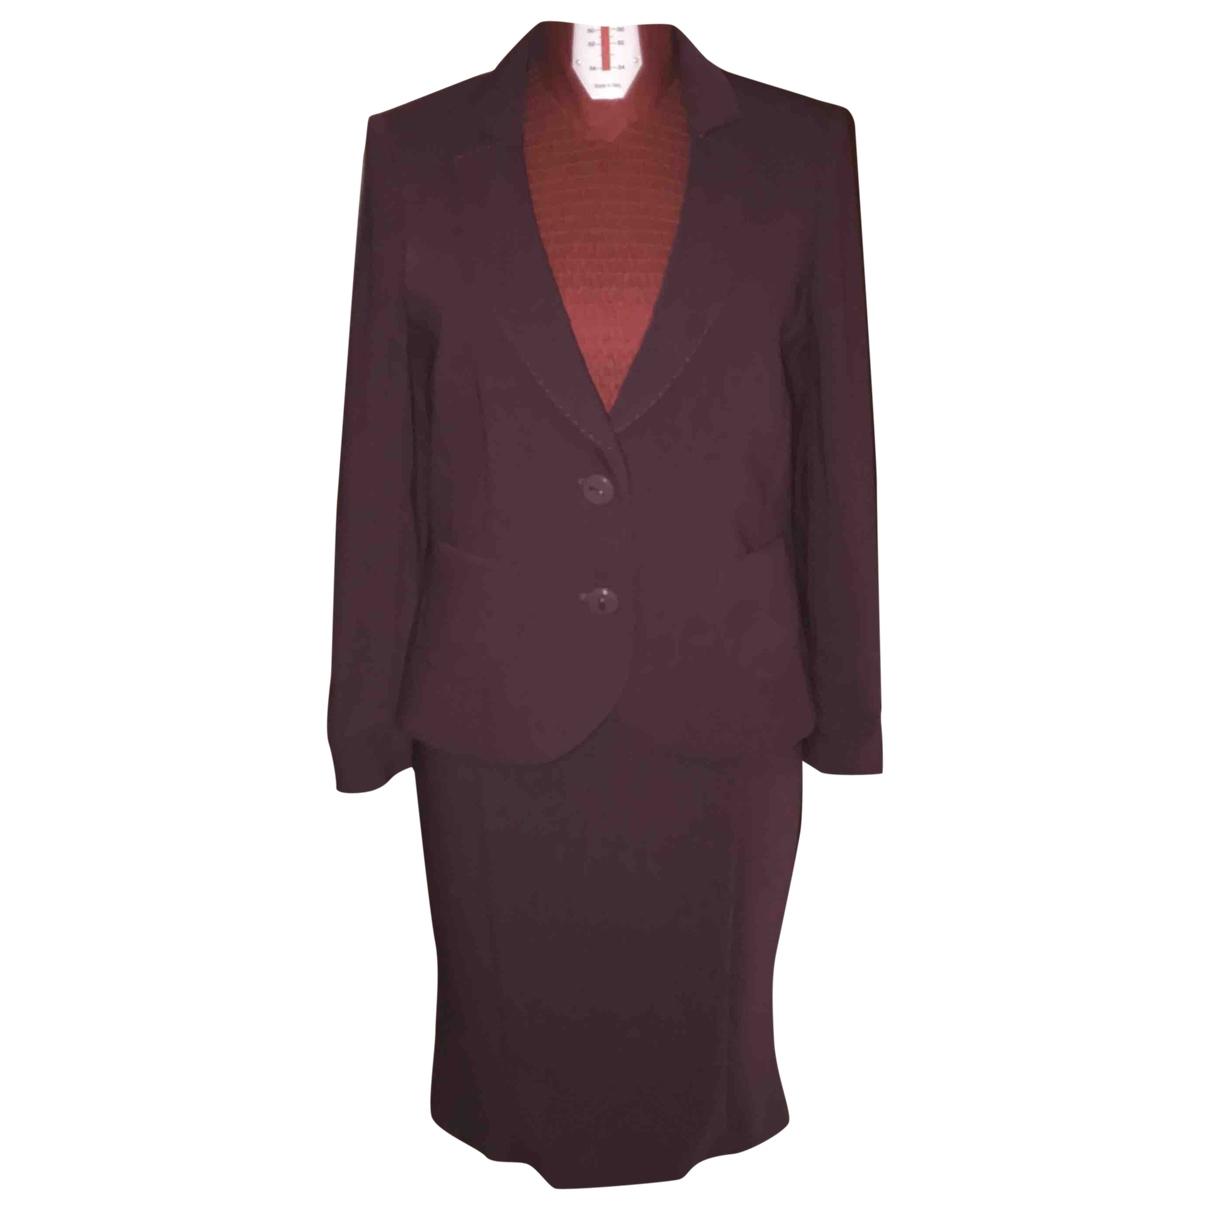 Mariella Rosati \N Burgundy jacket for Women 48 IT